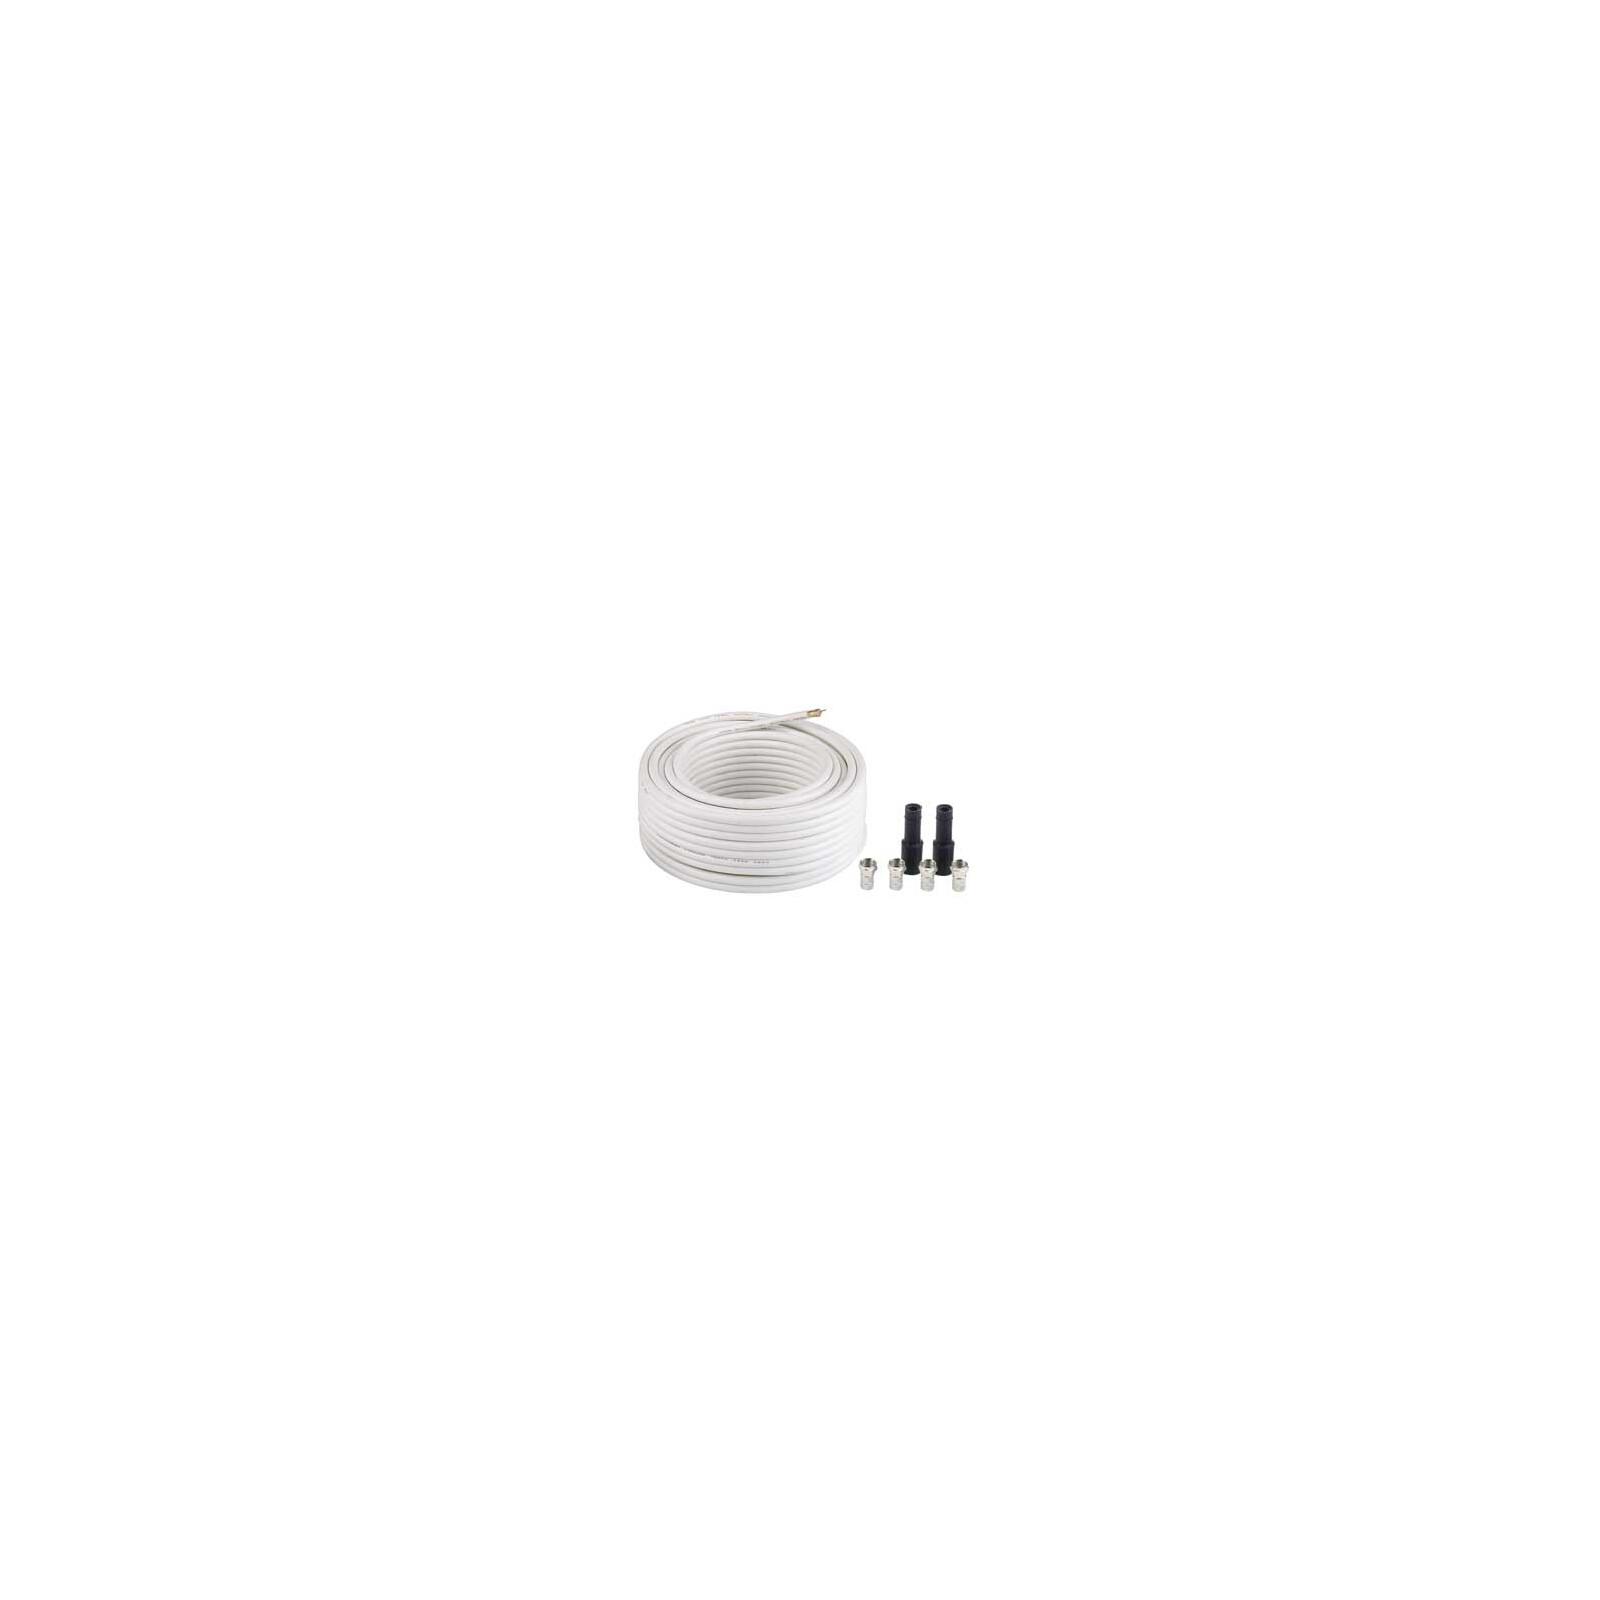 "Hama 56662 SAT-Anschluss-Kit ""Digital"", 100 dB, 40 m"